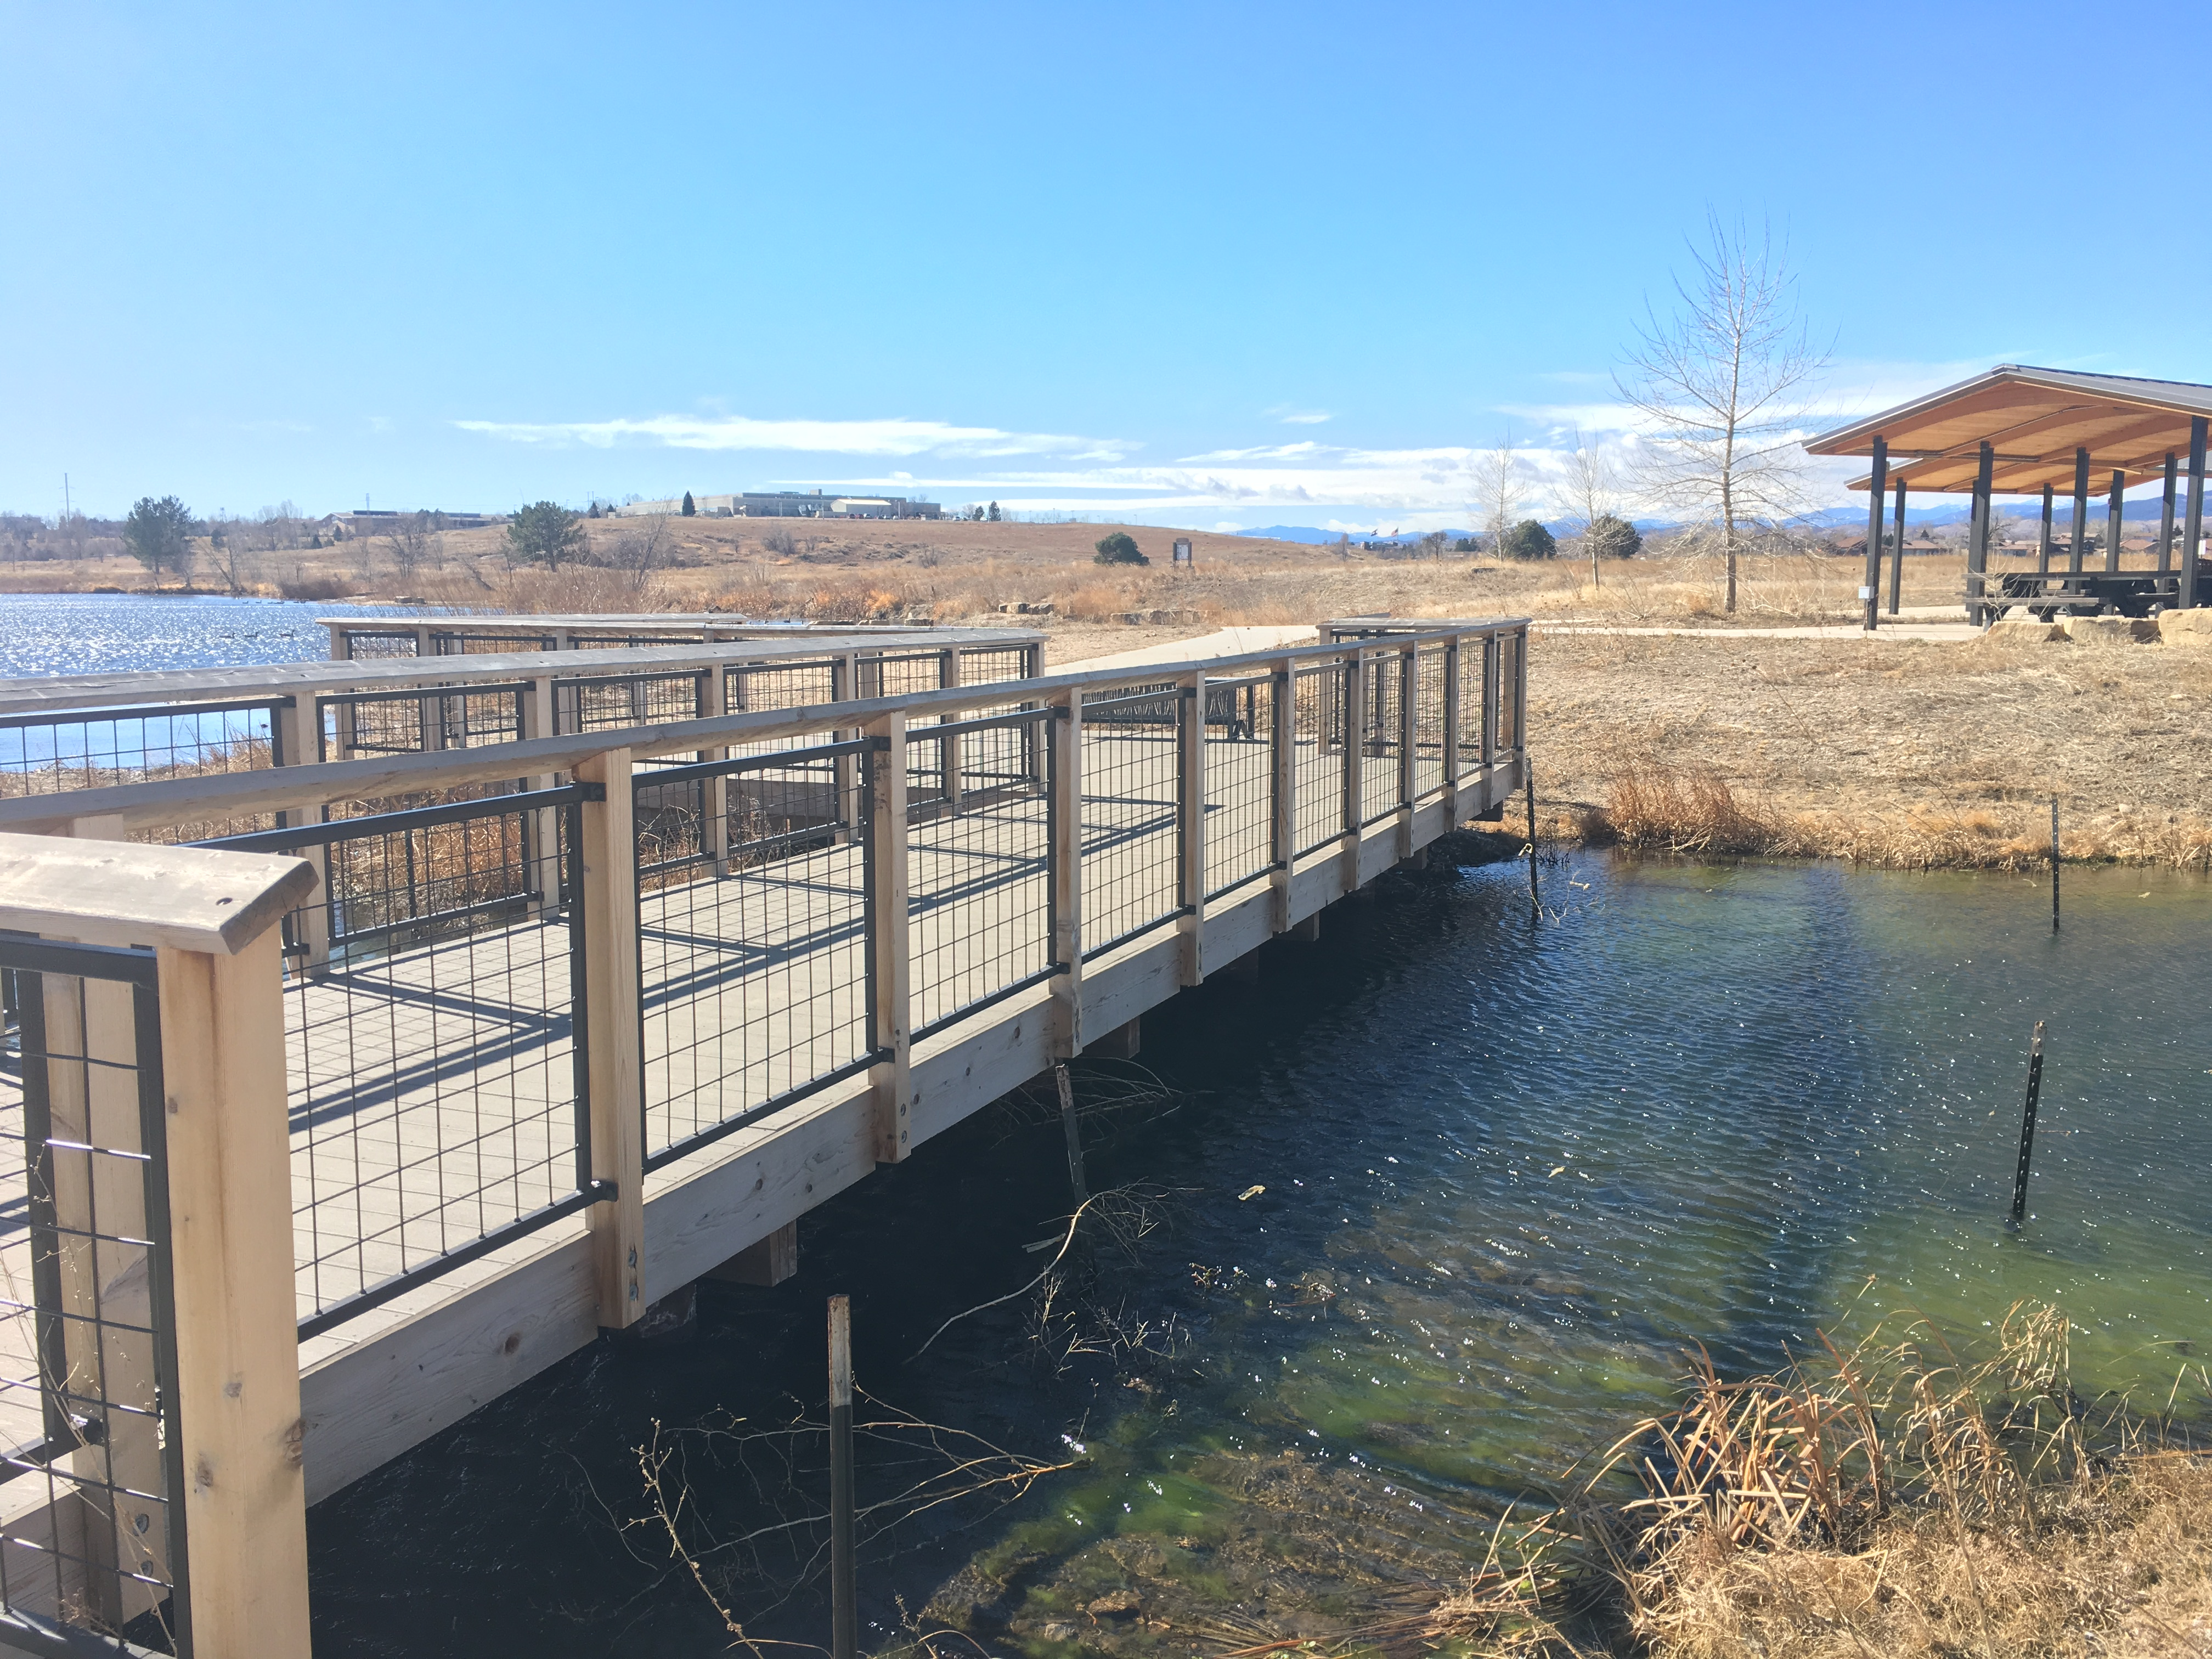 Wetlands boardwalk and shelters